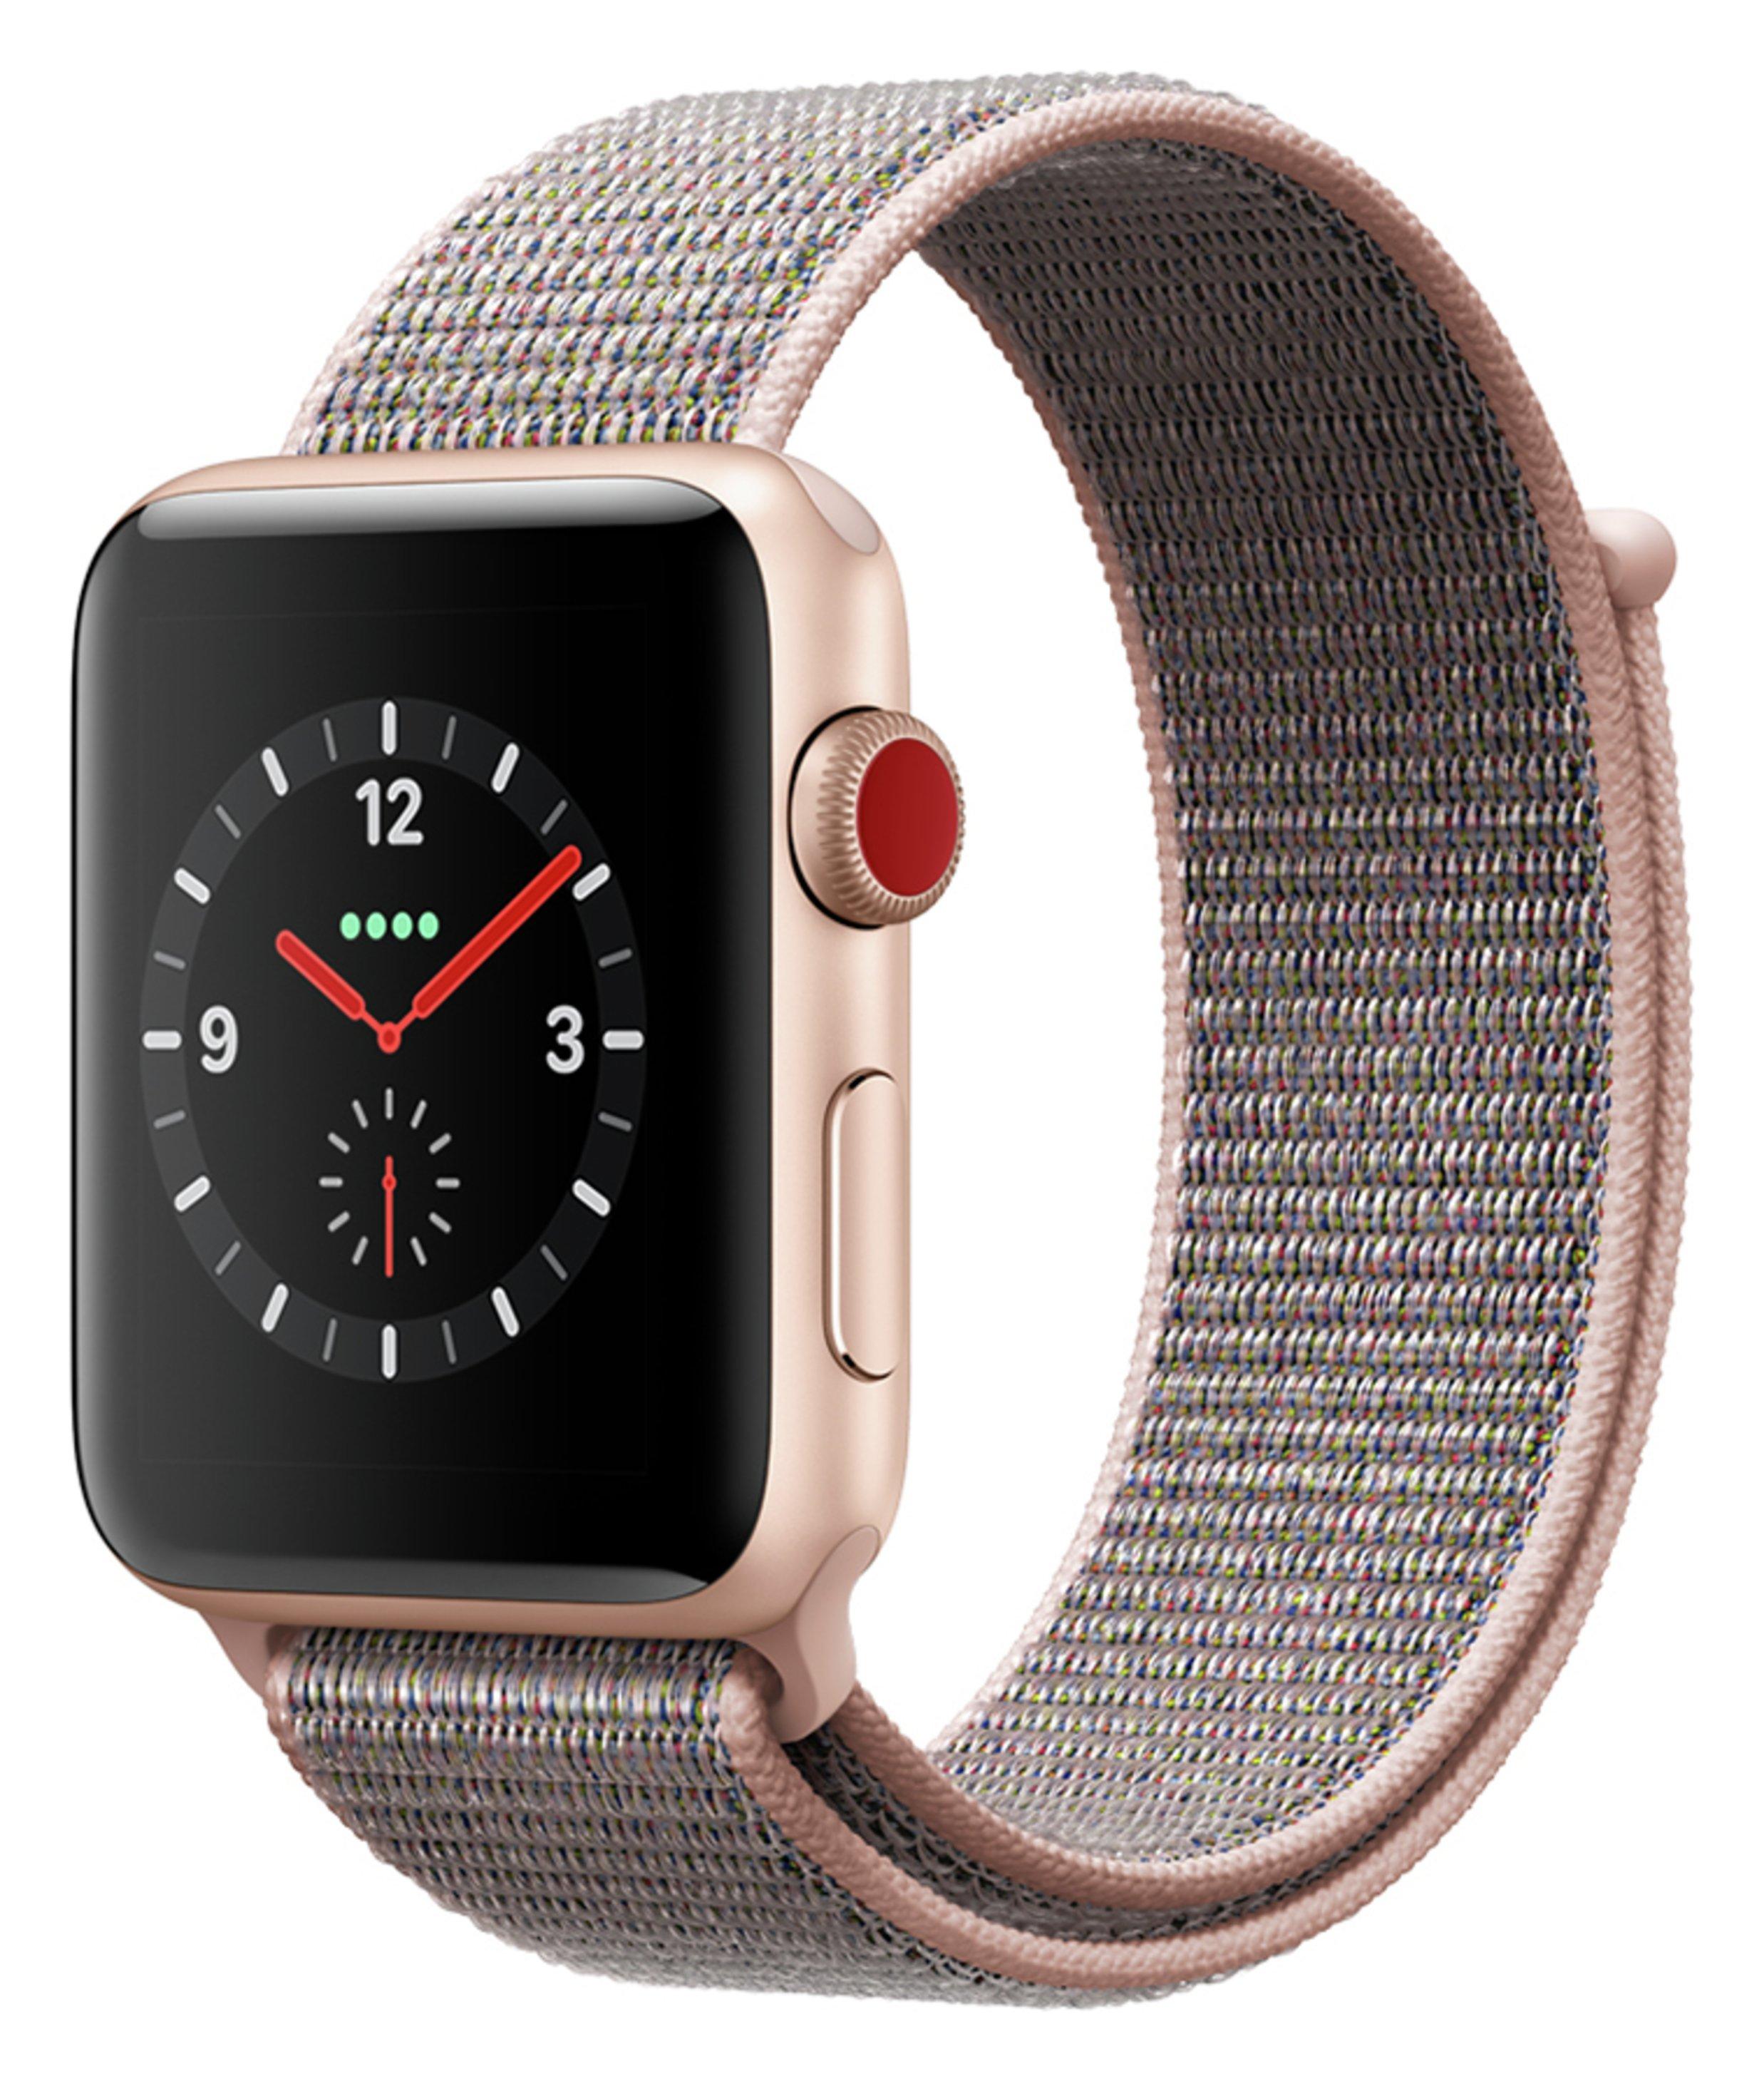 apple-watch-s3-cellular-38mm-gold-alu-case-pink-loop